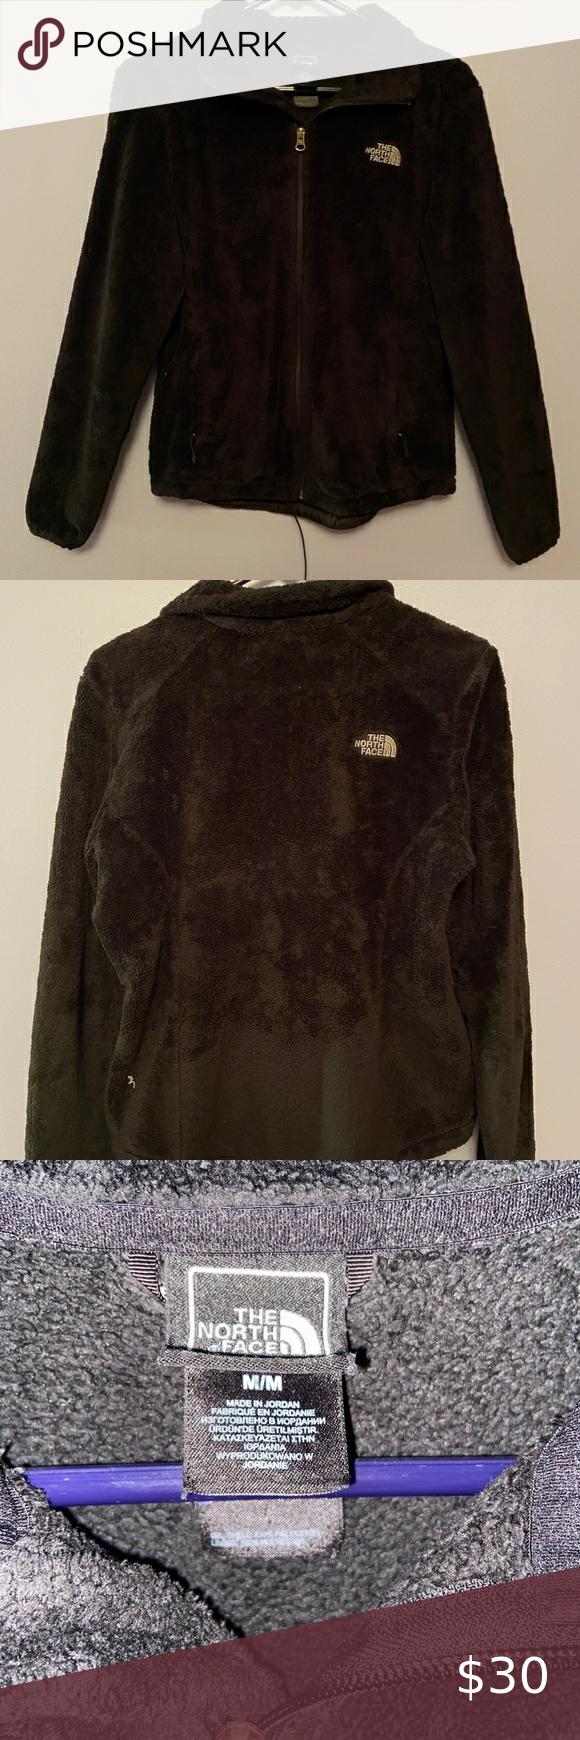 Northface Fleece Jacket Used In Good Condition Fleece Has Some Wearing Down From Washing But O Black North Face Jacket Winter Jacket North Face Fleece Jacket [ 1740 x 580 Pixel ]